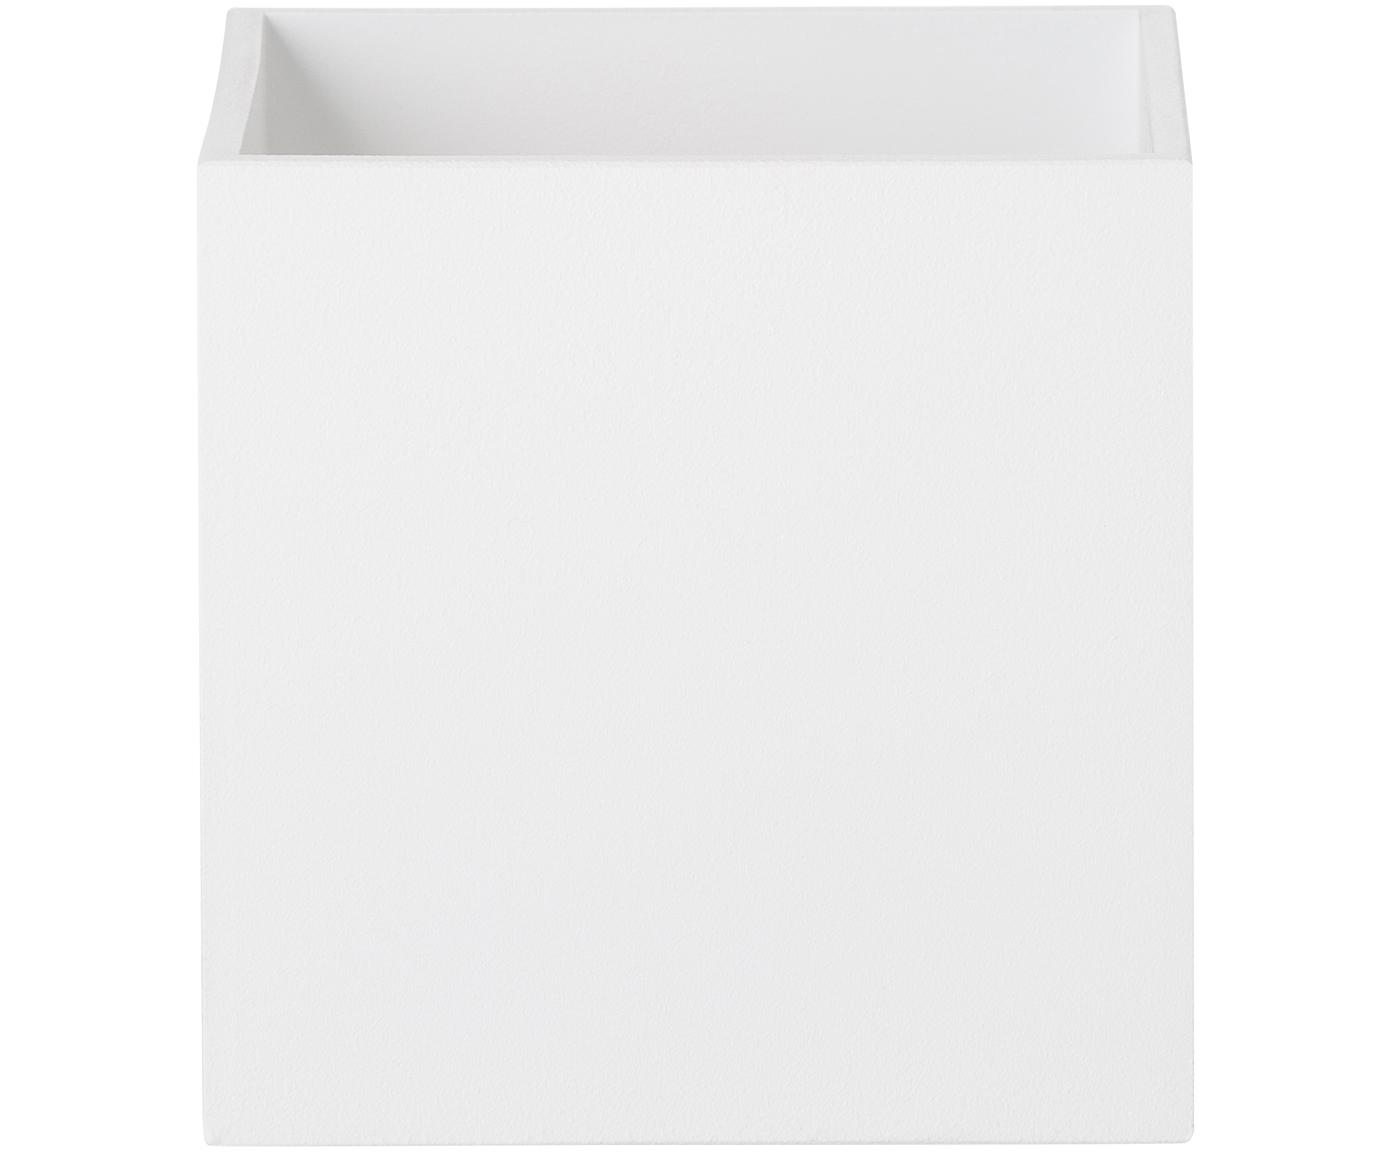 Aplique Quad, Aluminio con pintura en polvo, Blanco, An 10 x Al 10 cm